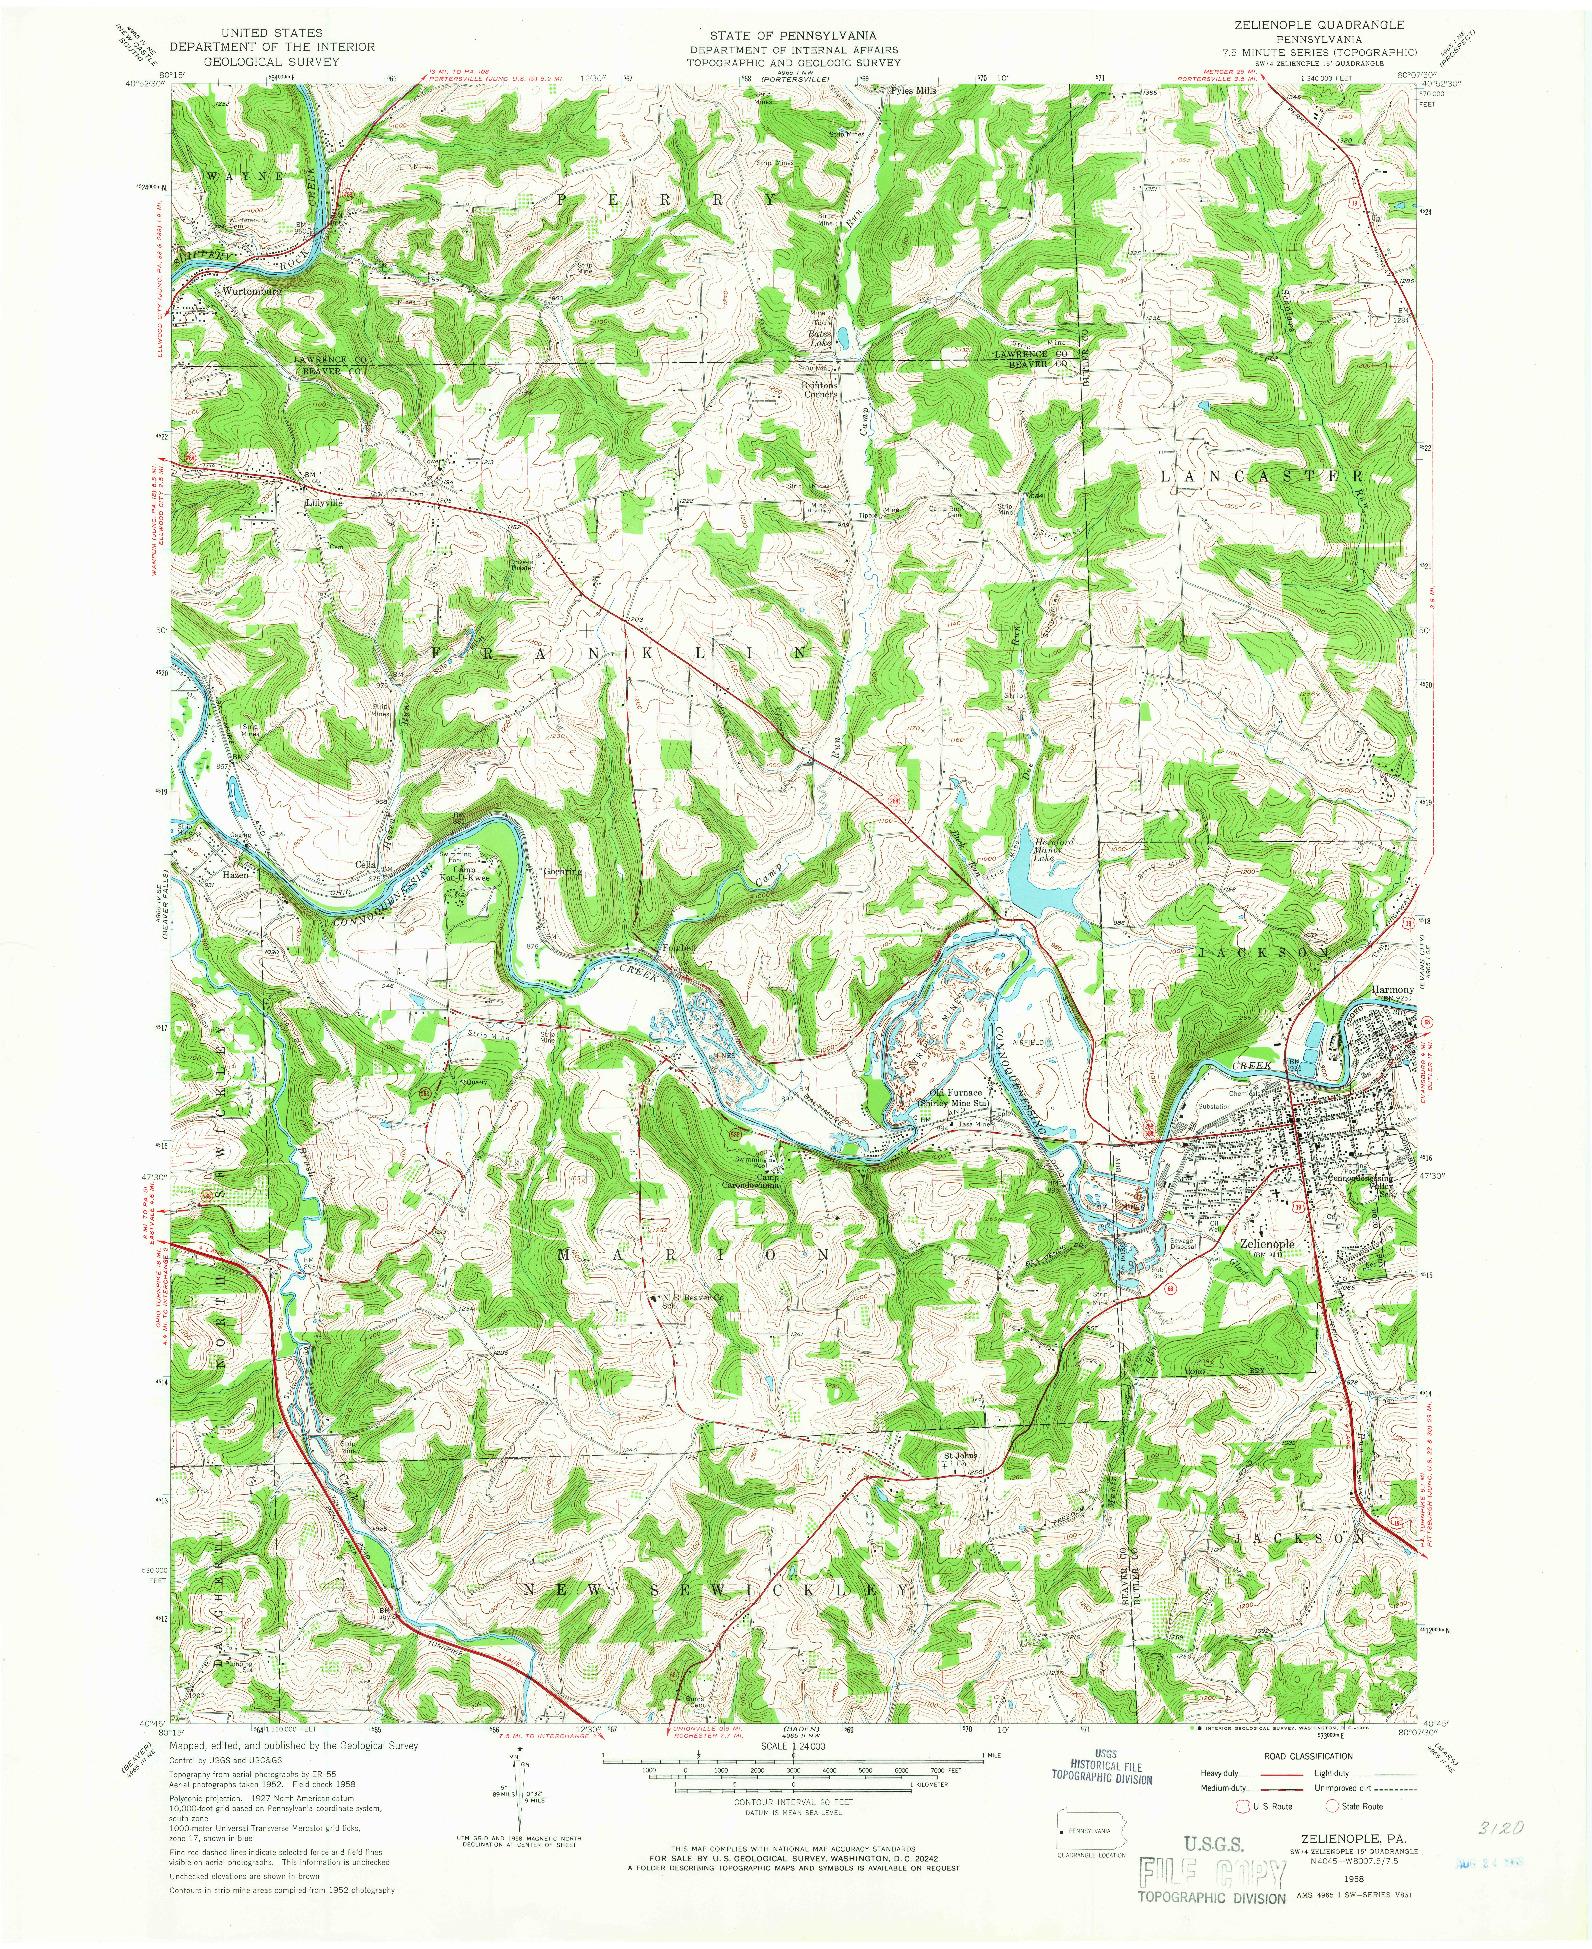 USGS 1:24000-SCALE QUADRANGLE FOR ZELIENOPLE, PA 1958 on